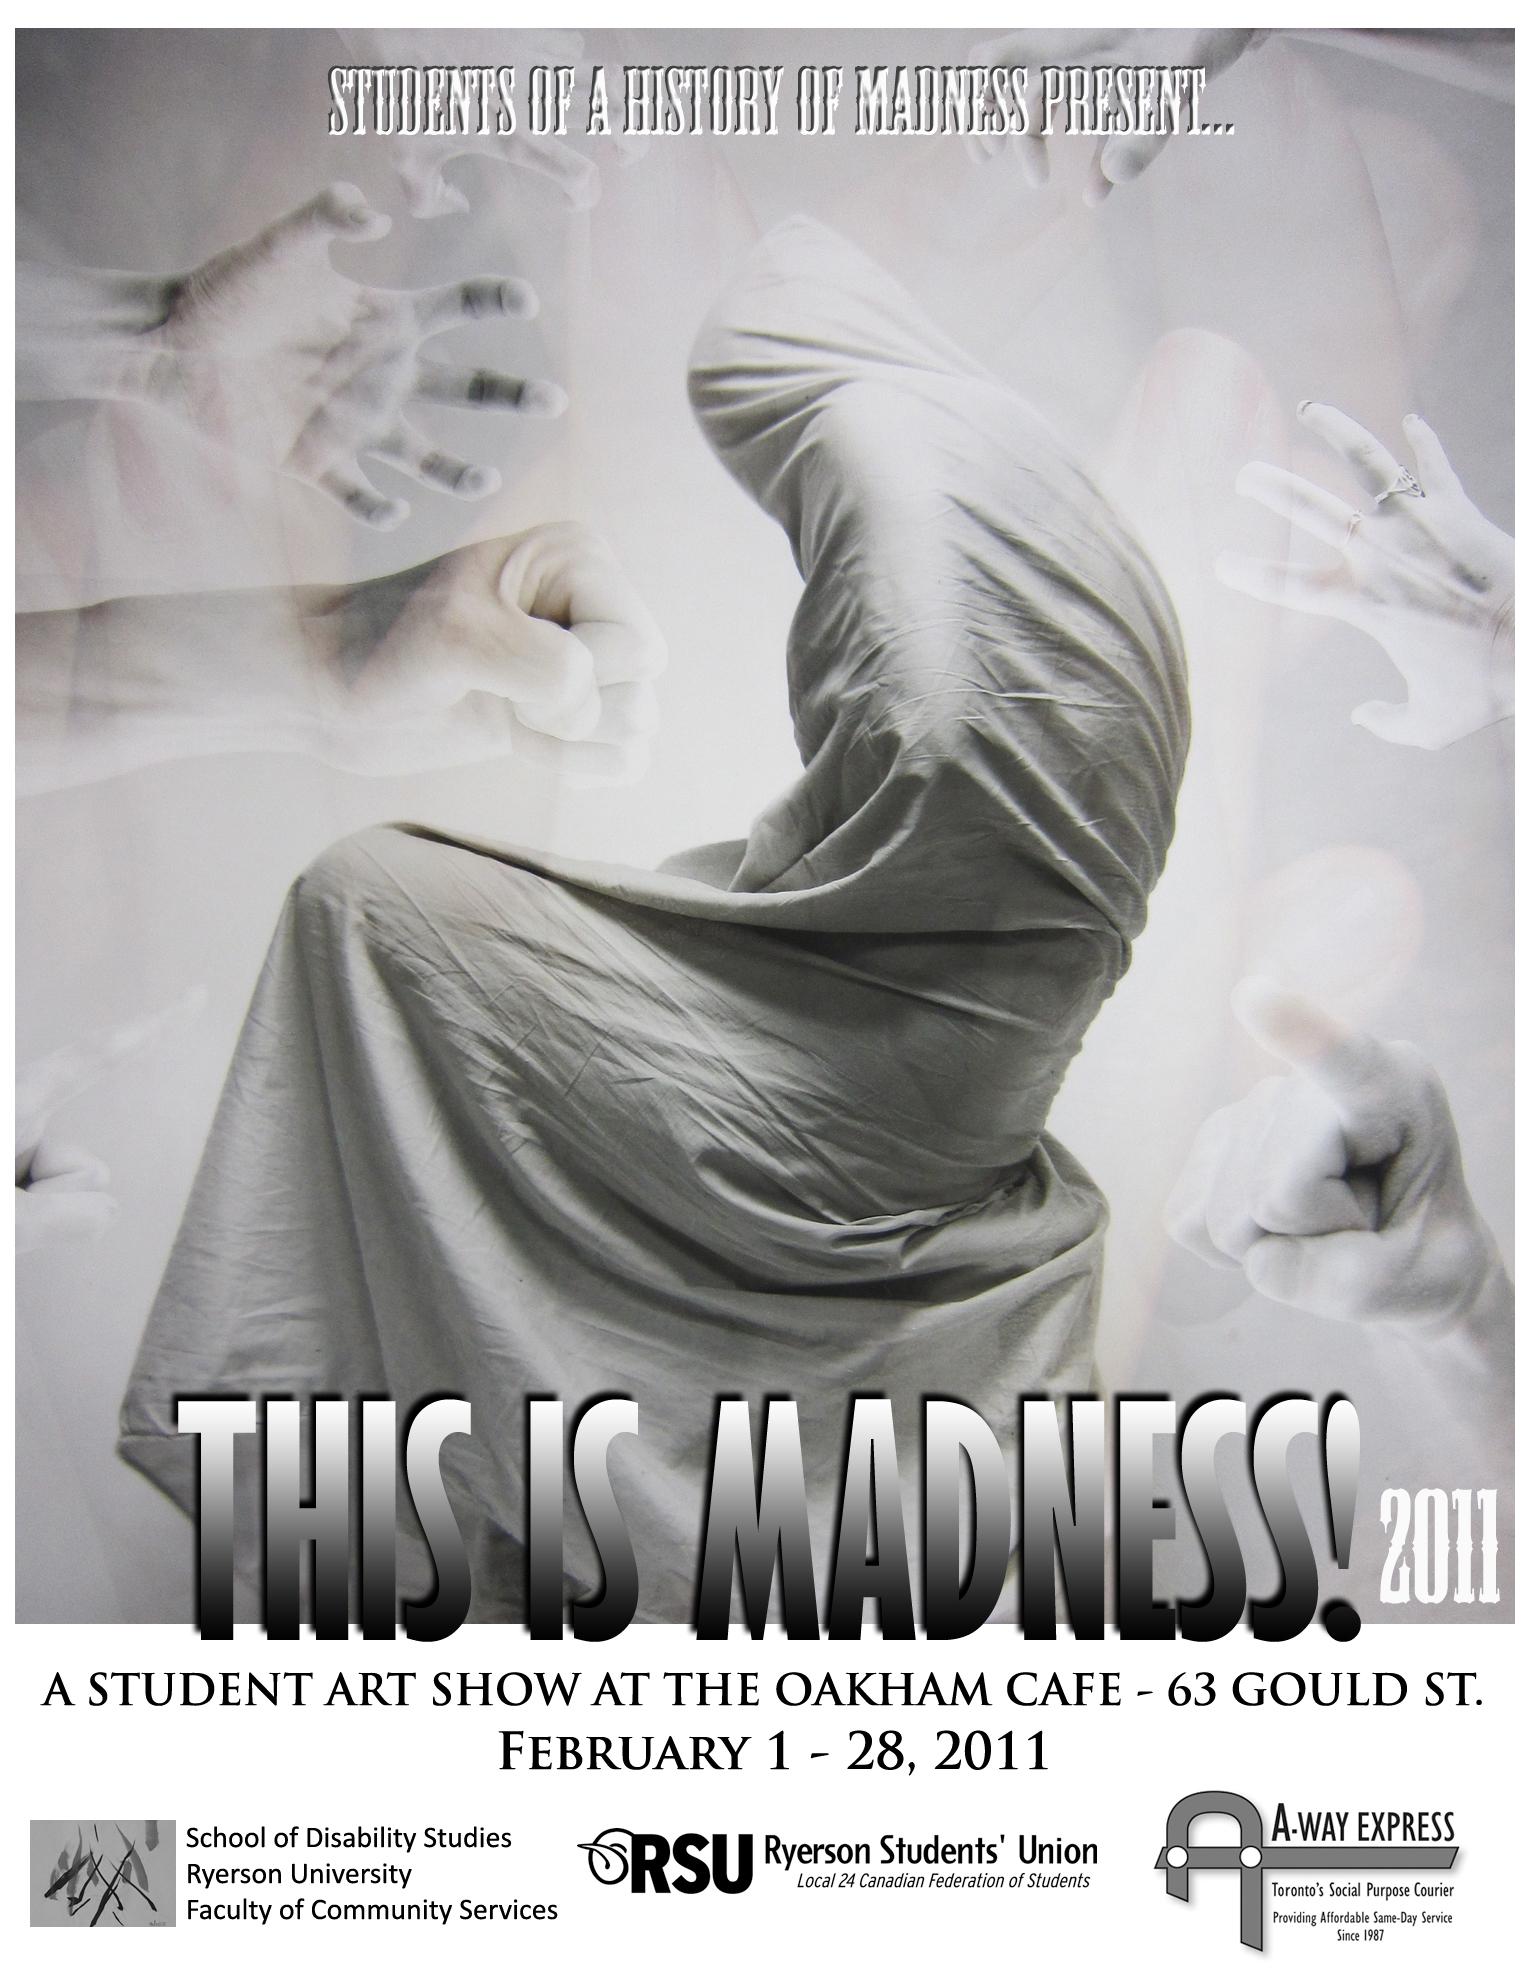 MadnessII_ryerson university